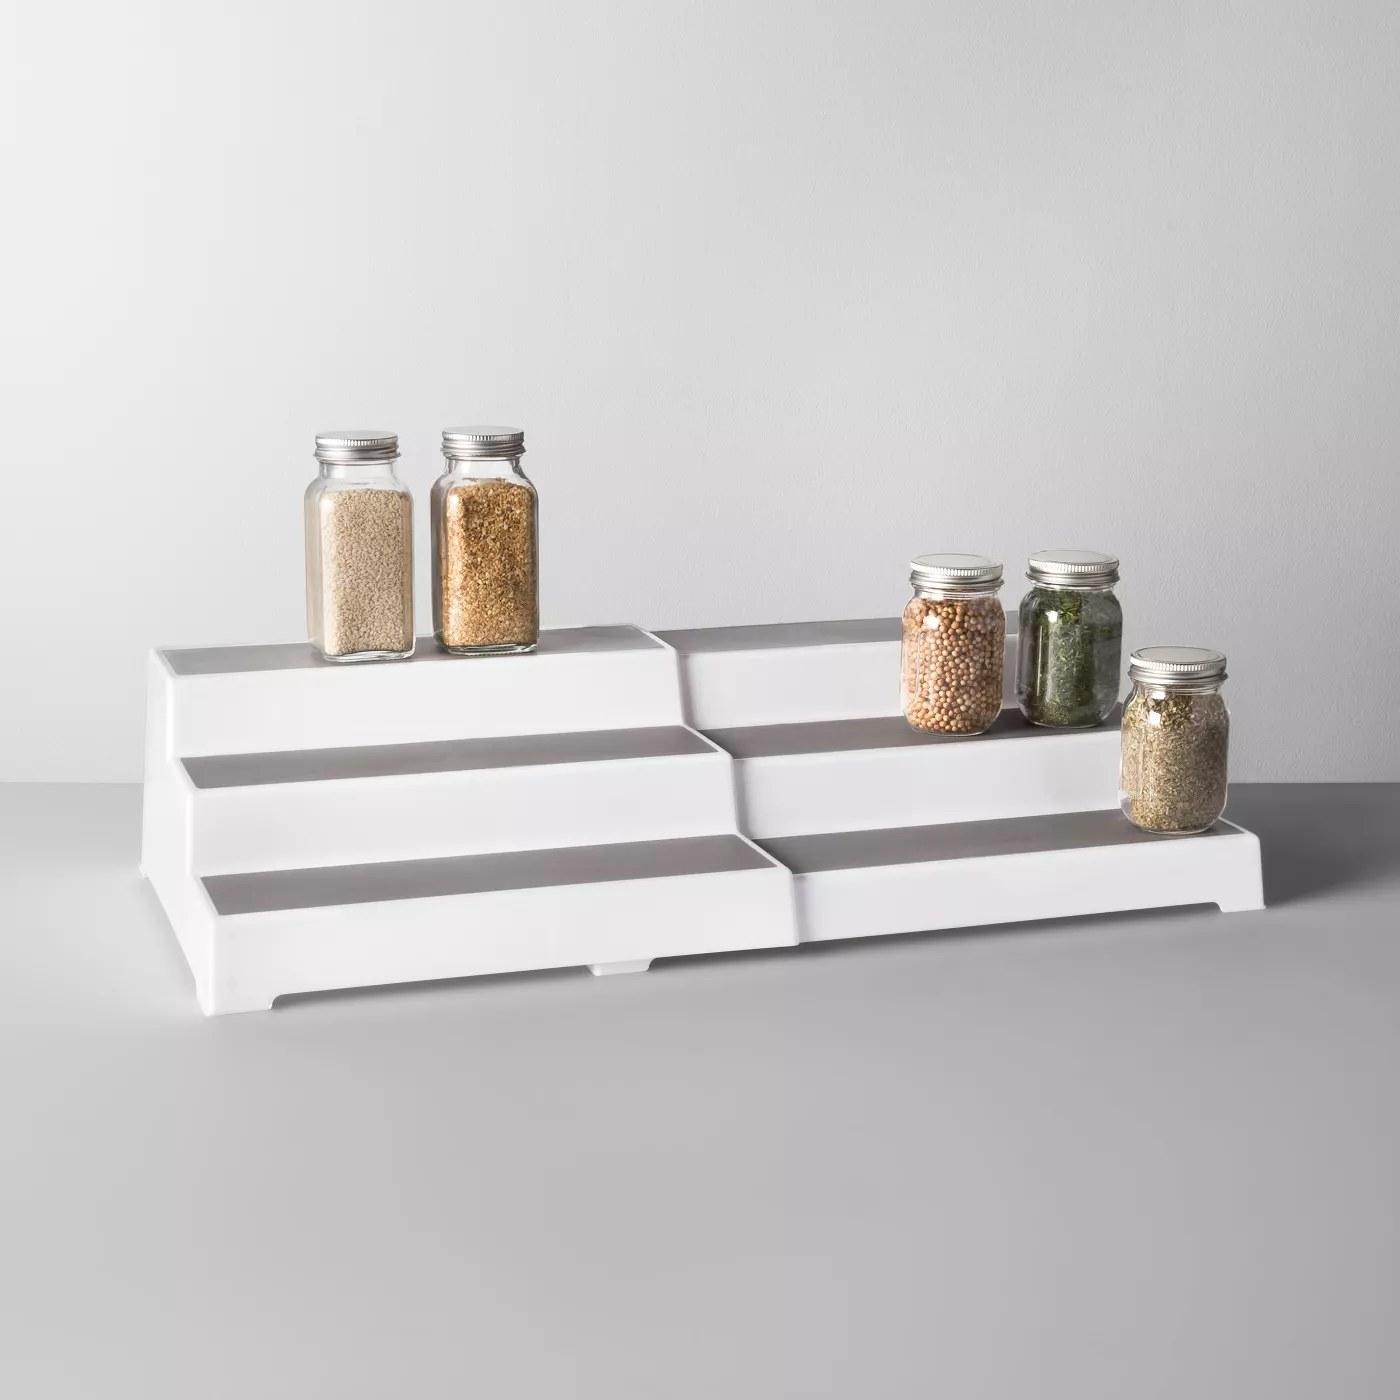 An expandable shelf